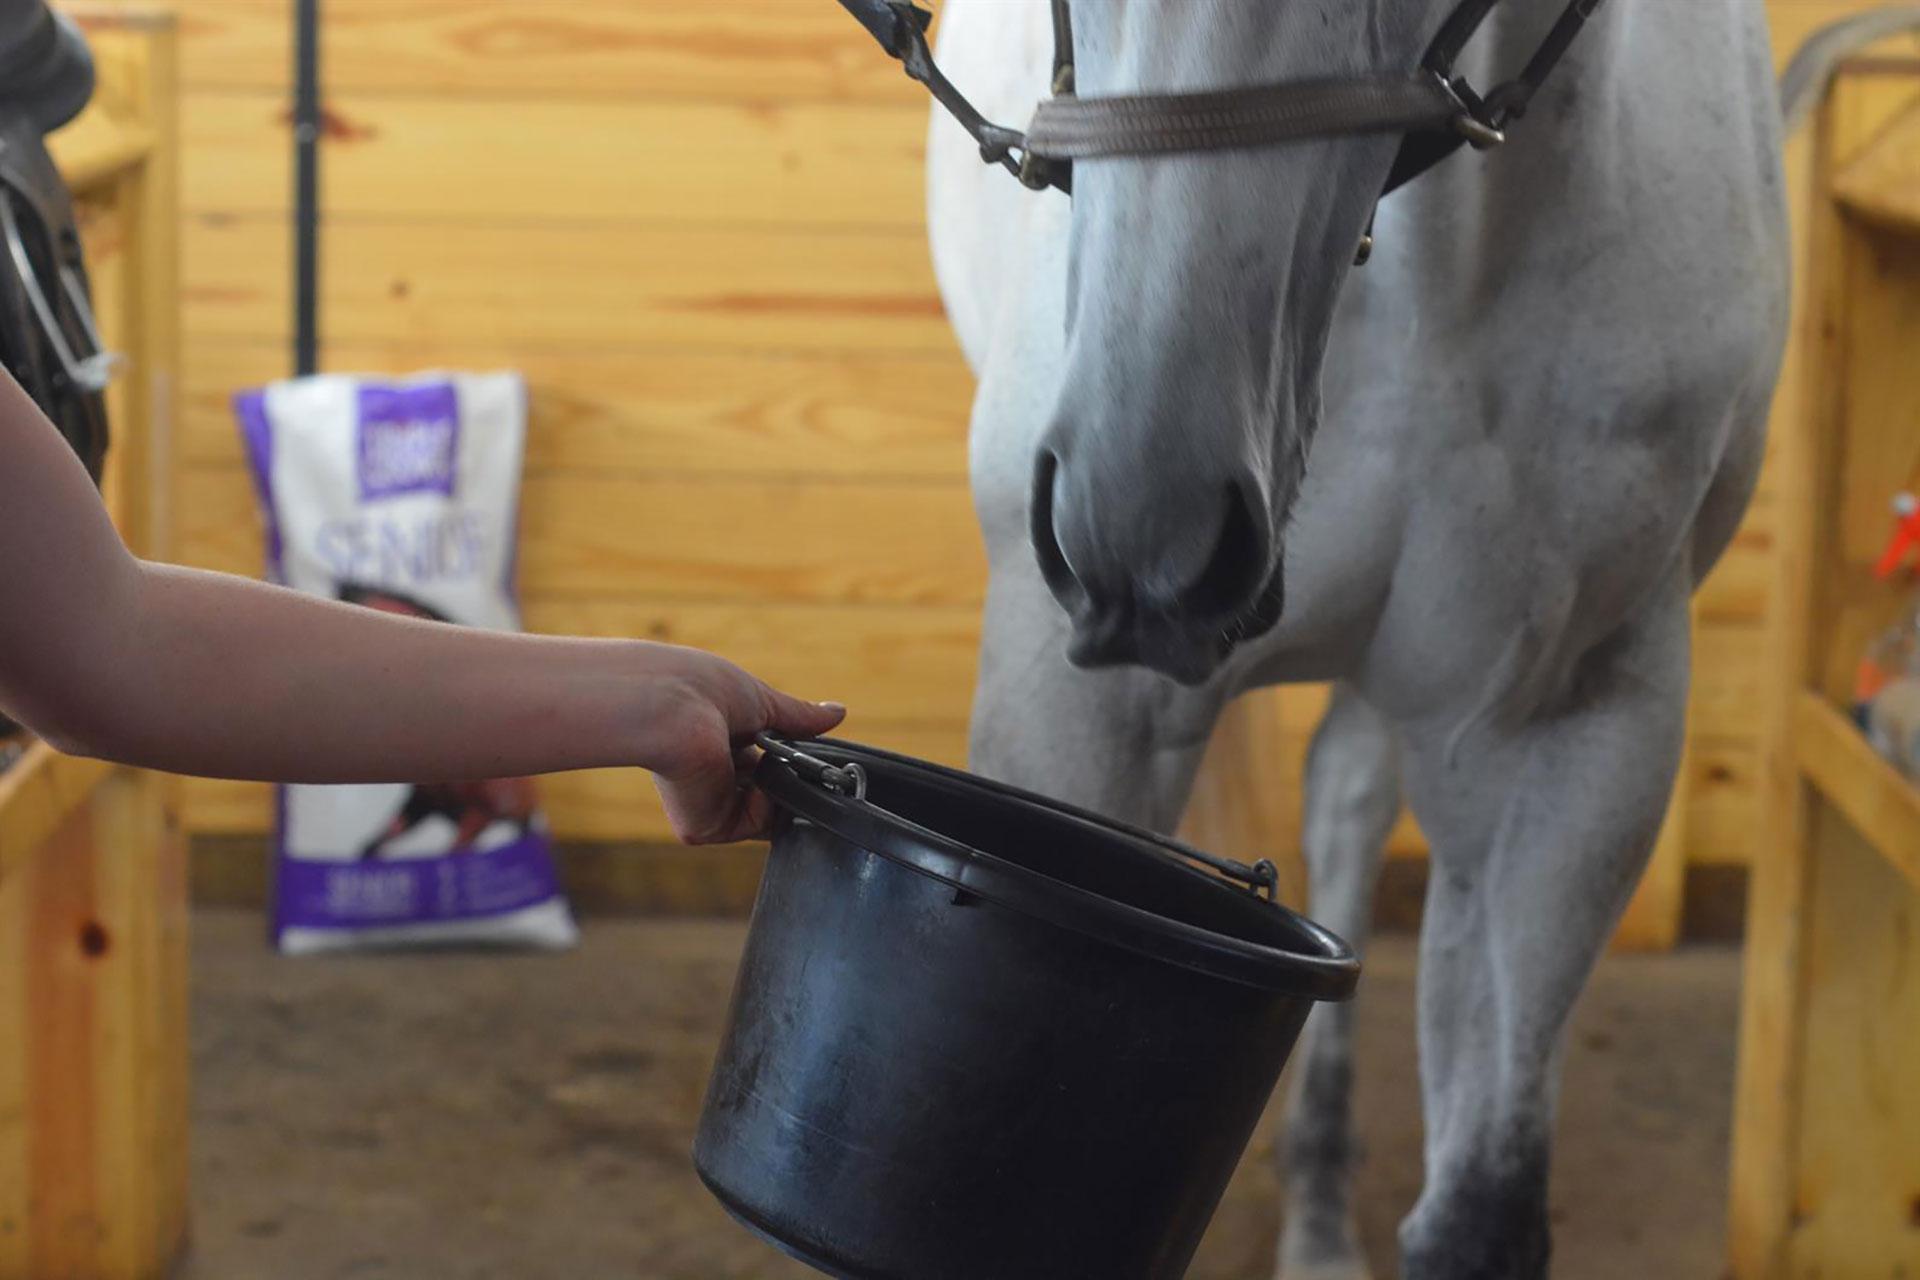 Equine Digestion Supplements and Probiotics